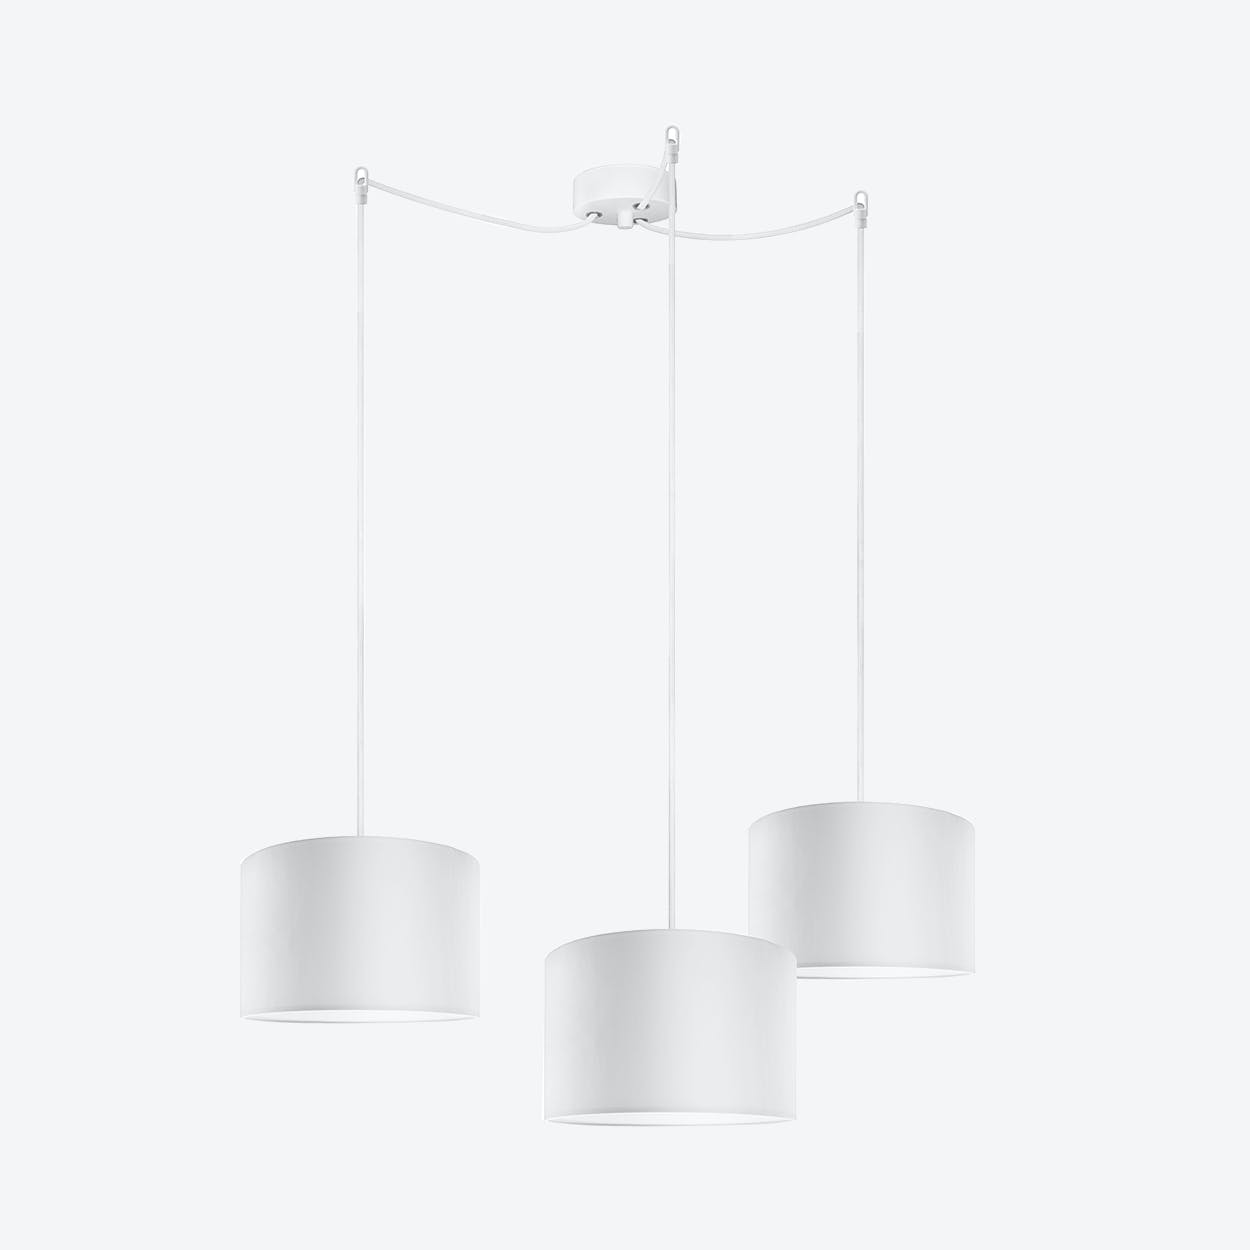 MIKA Small Triple Pendant Light in White